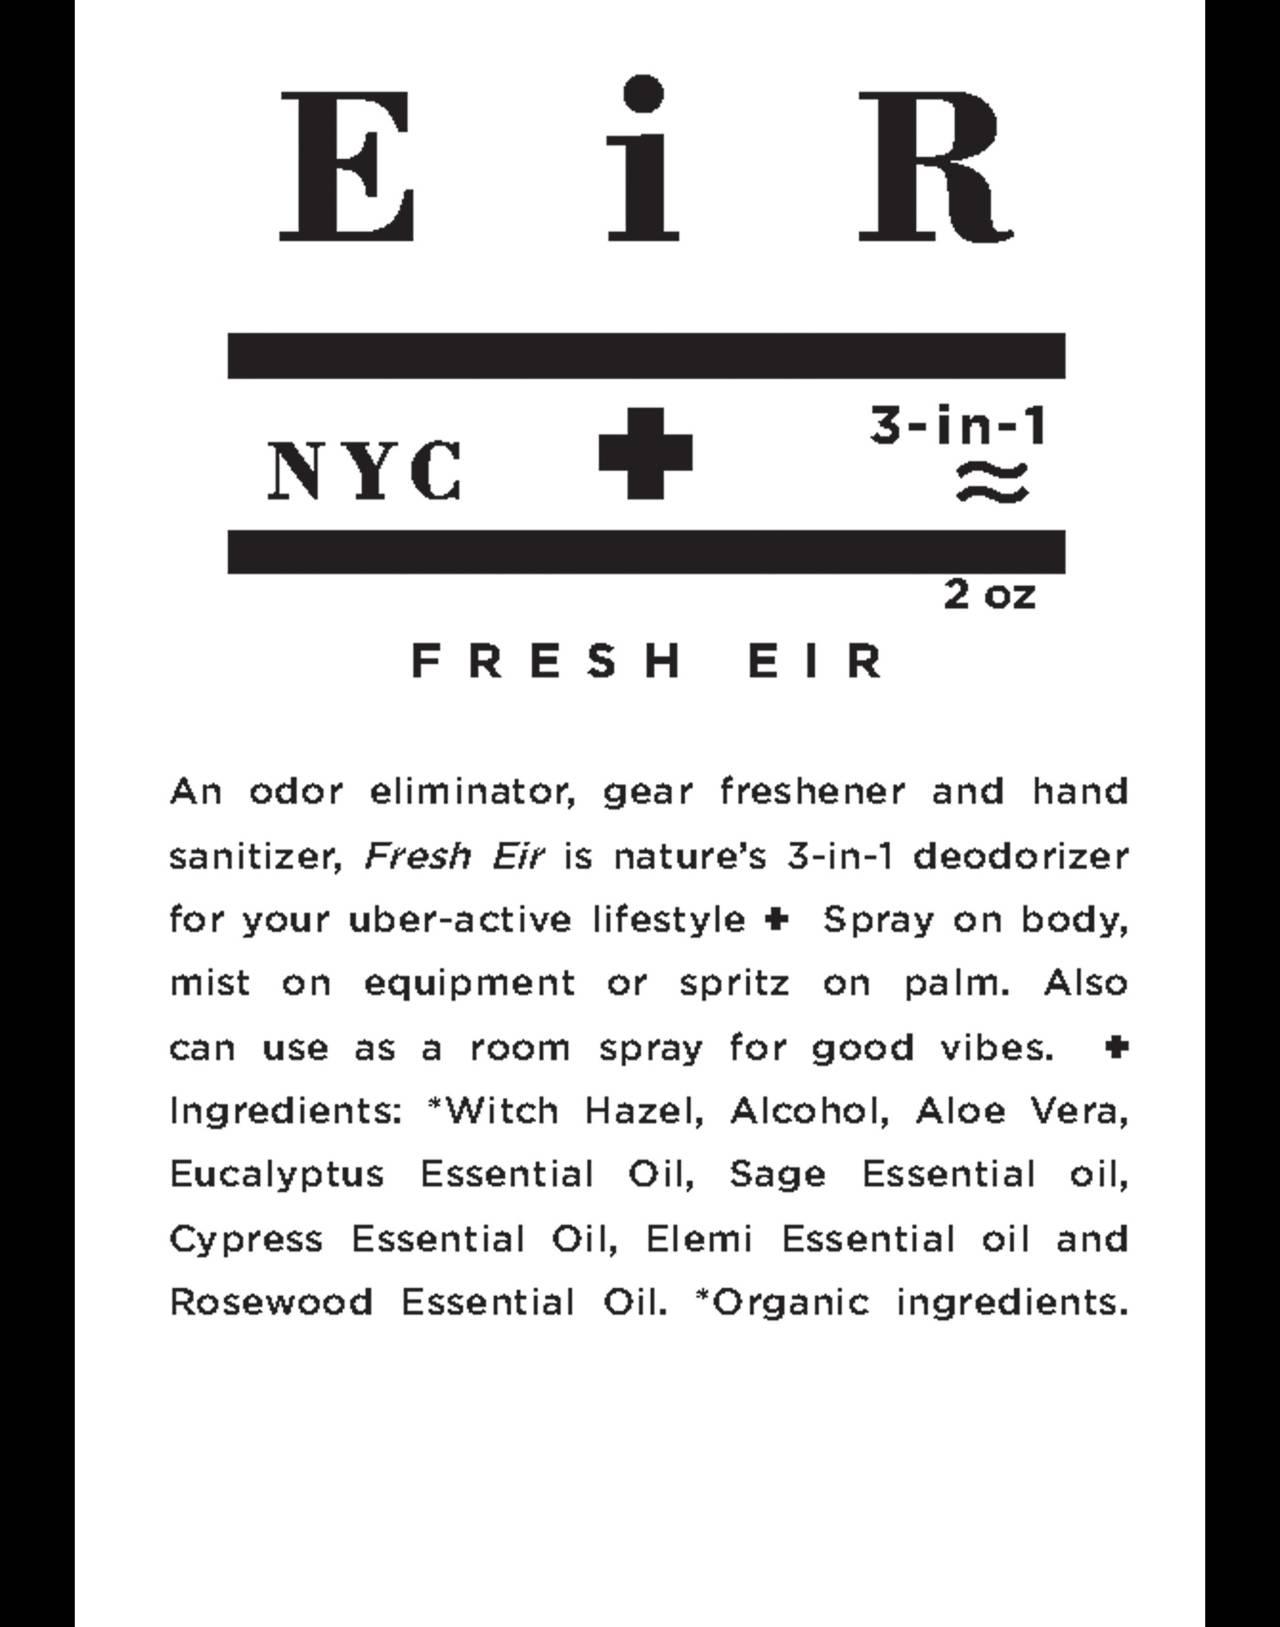 Eir NYC® Fresh Eir Hand Sanitizer and Deodorizing Spray in one color image 2